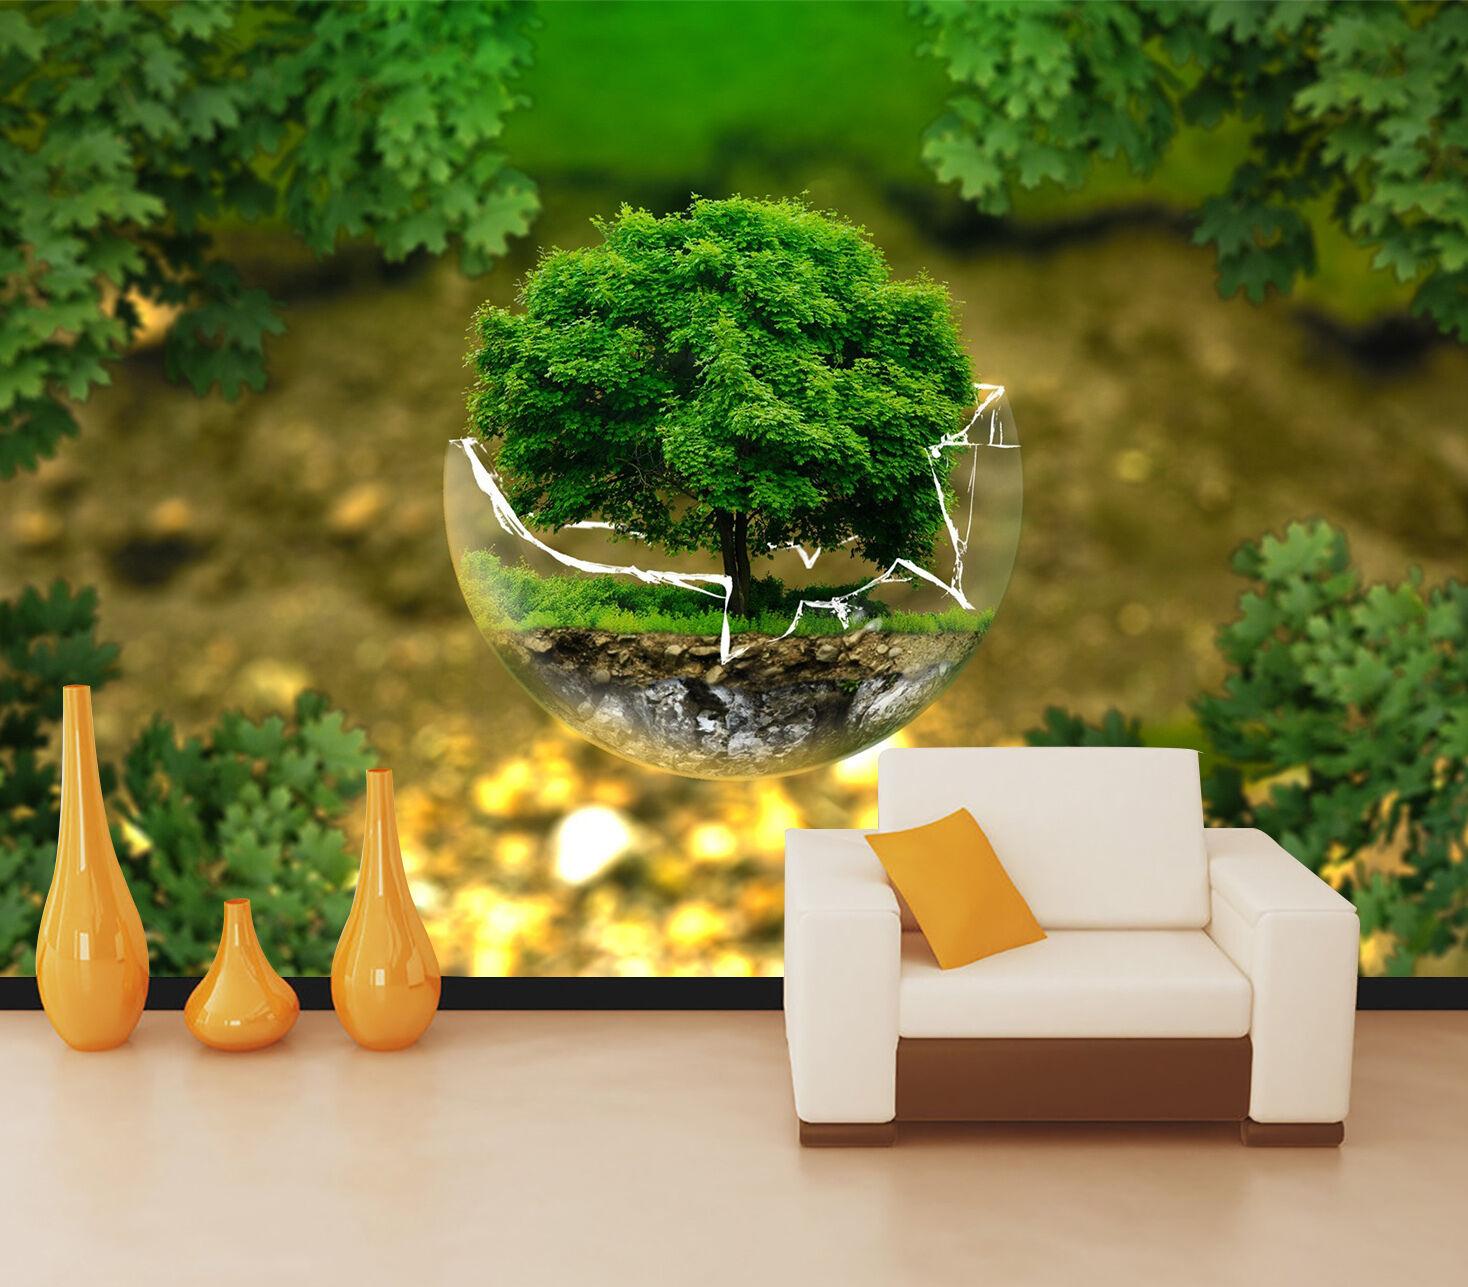 3D green Albero 4 Parete Murale Foto Carta da parati immagine sfondo muro stampa